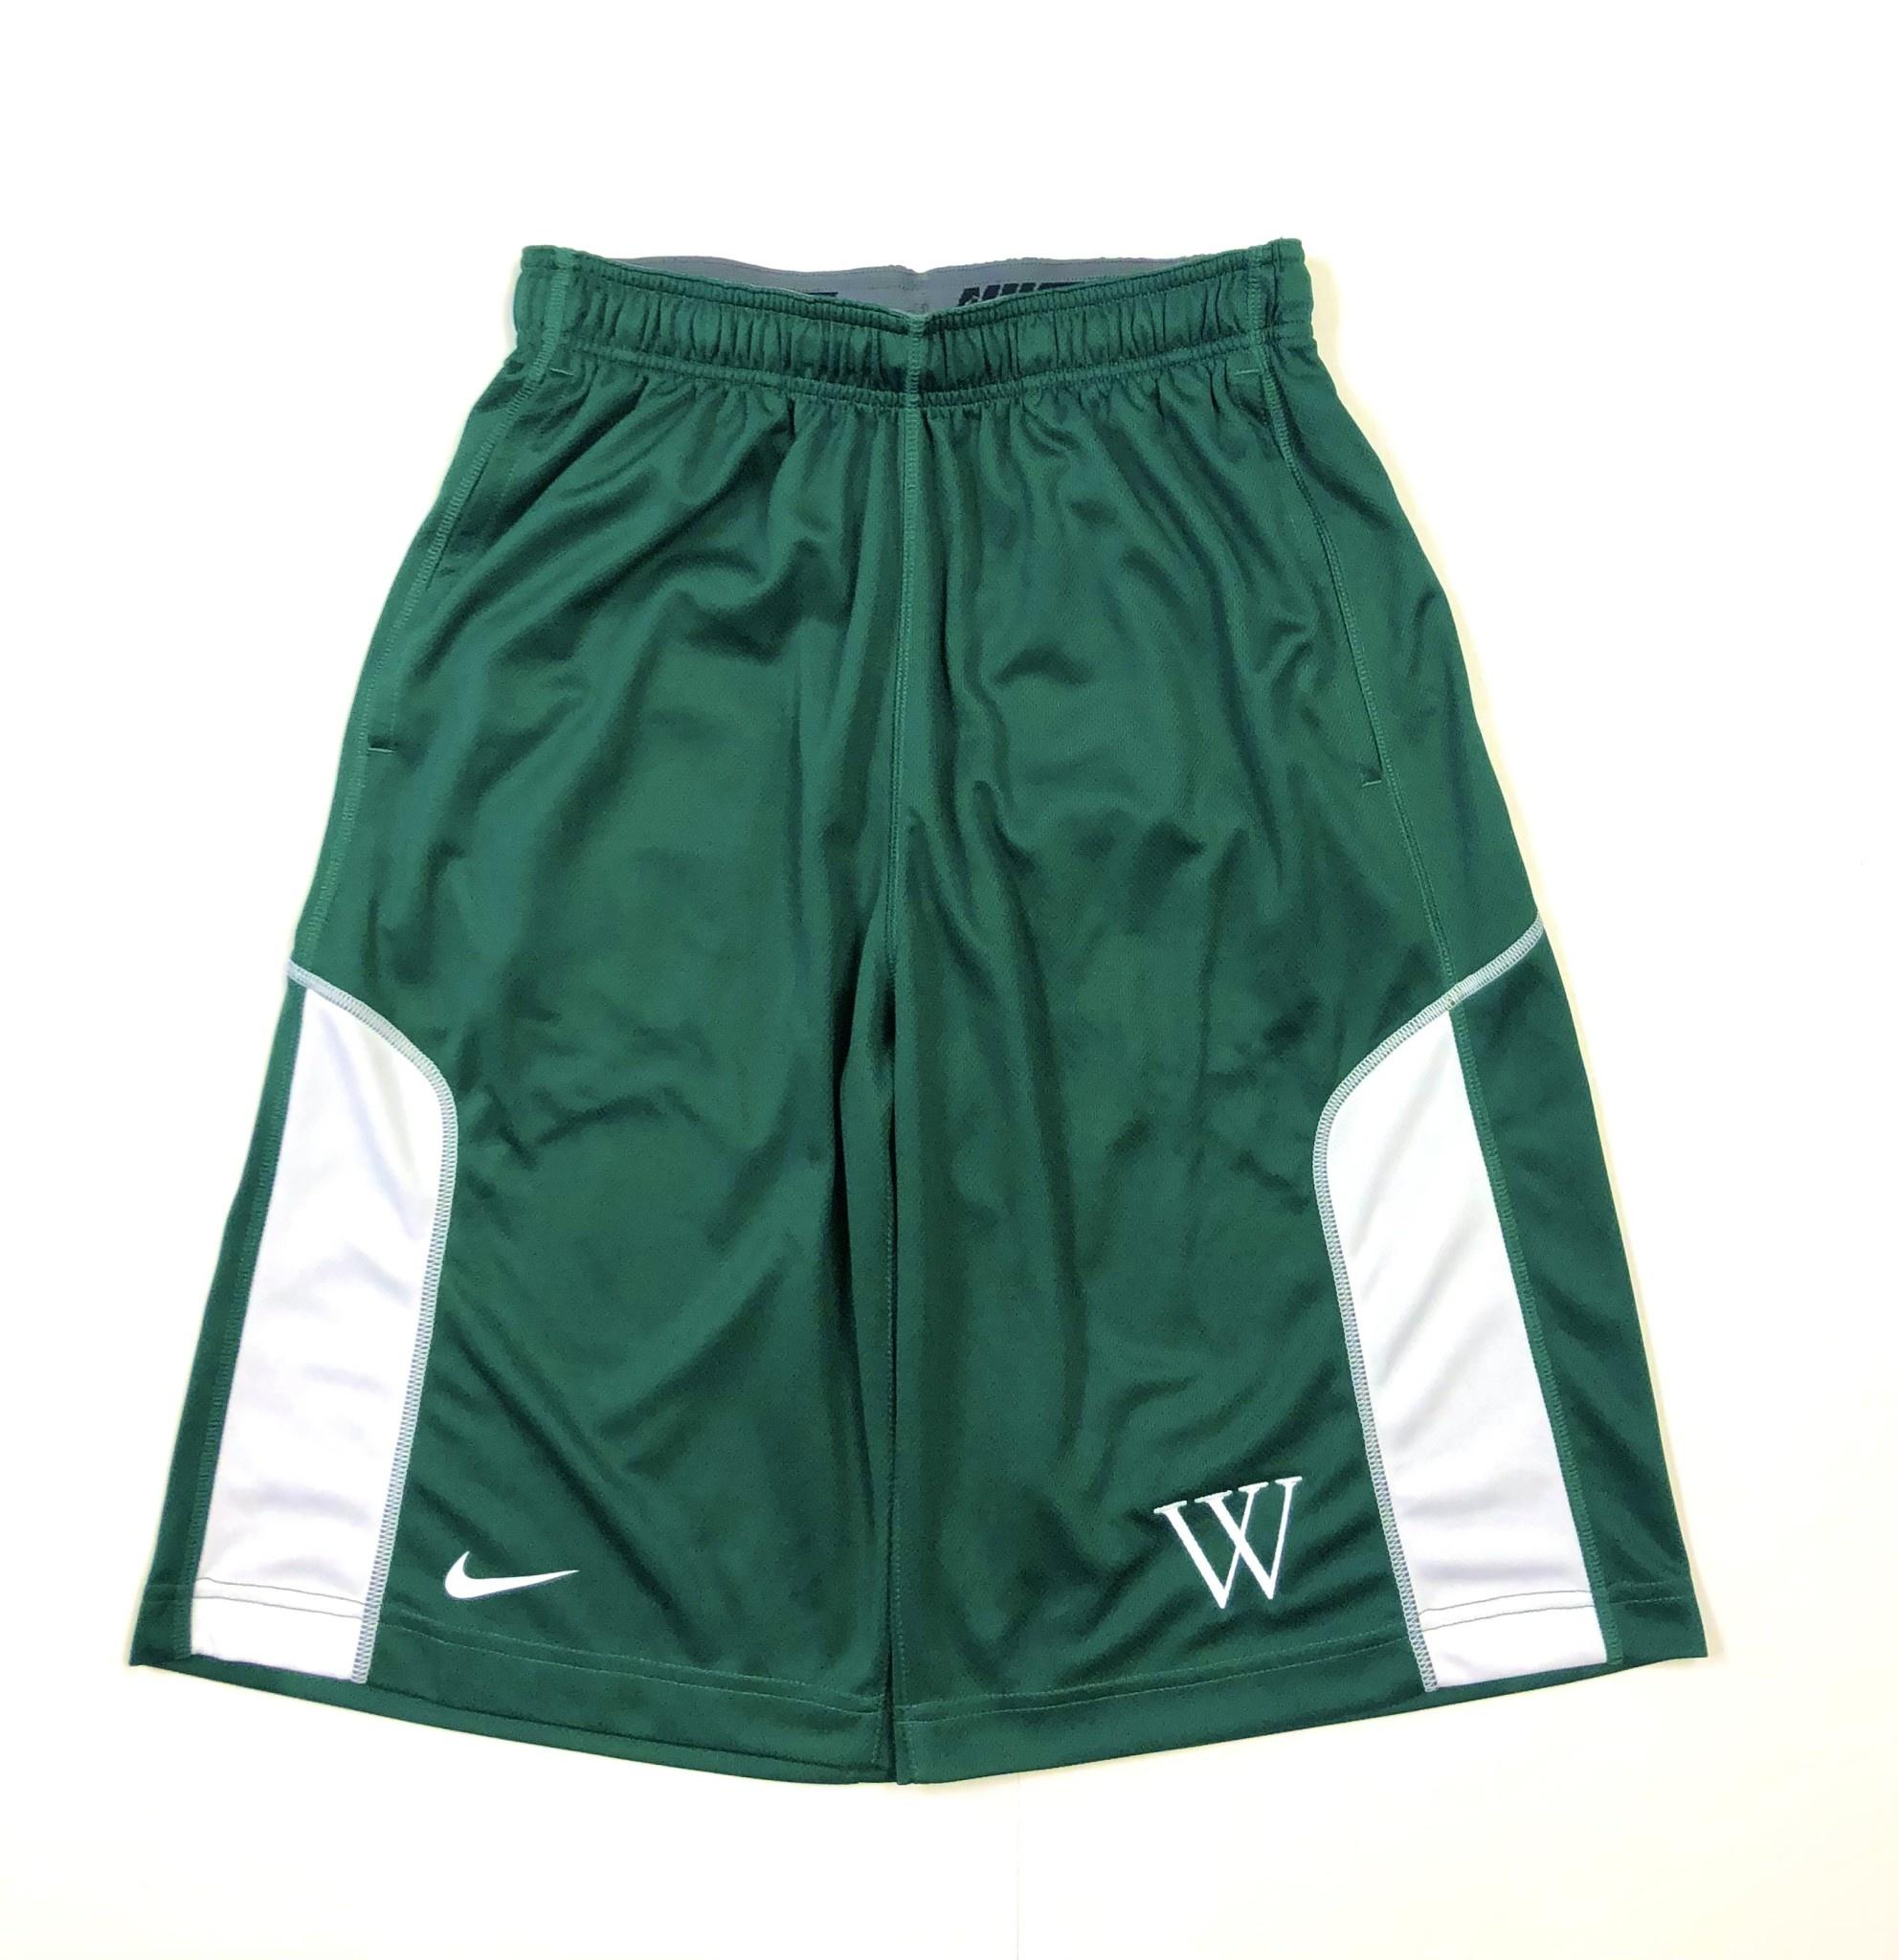 Nike Shorts: Nike Fly Green/White